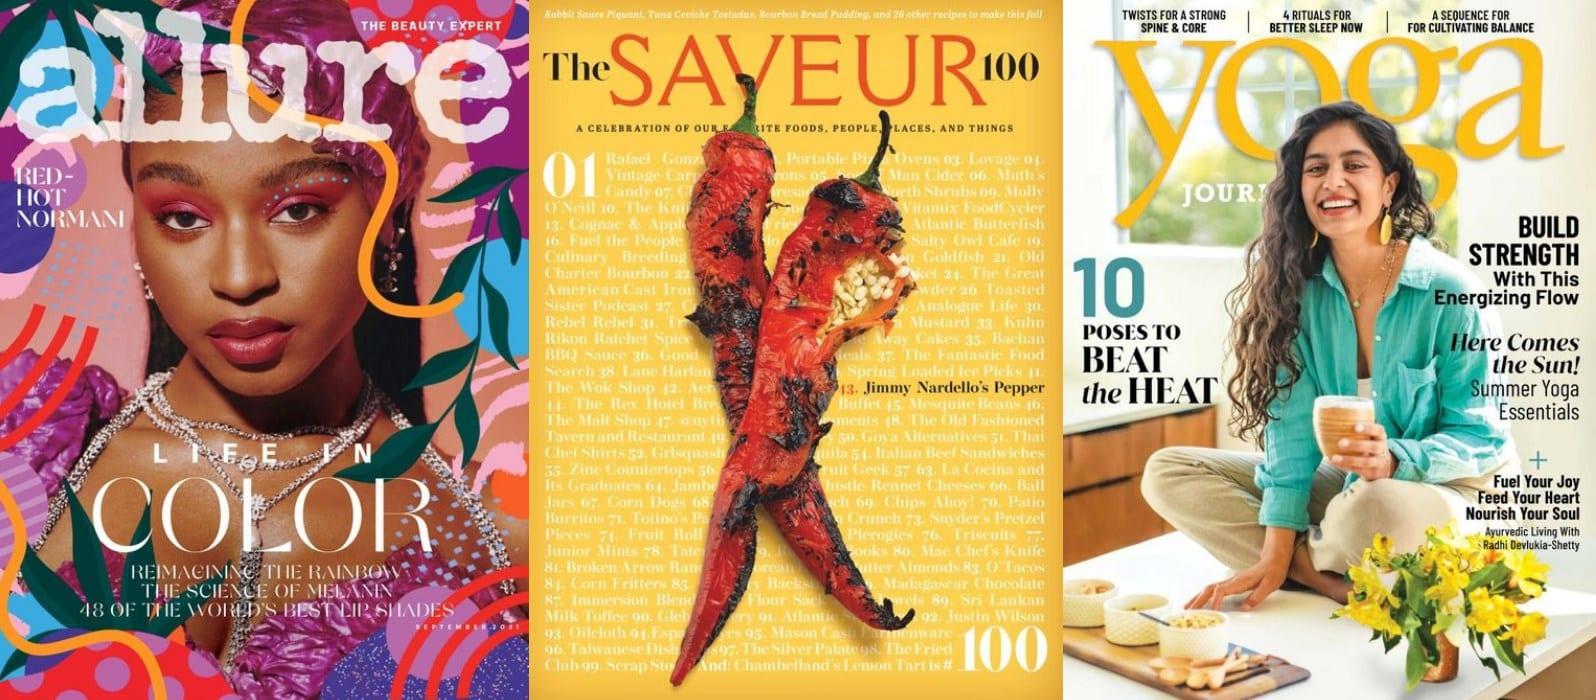 Allure, Saveur, and Yoga digital magazine on Overdrive